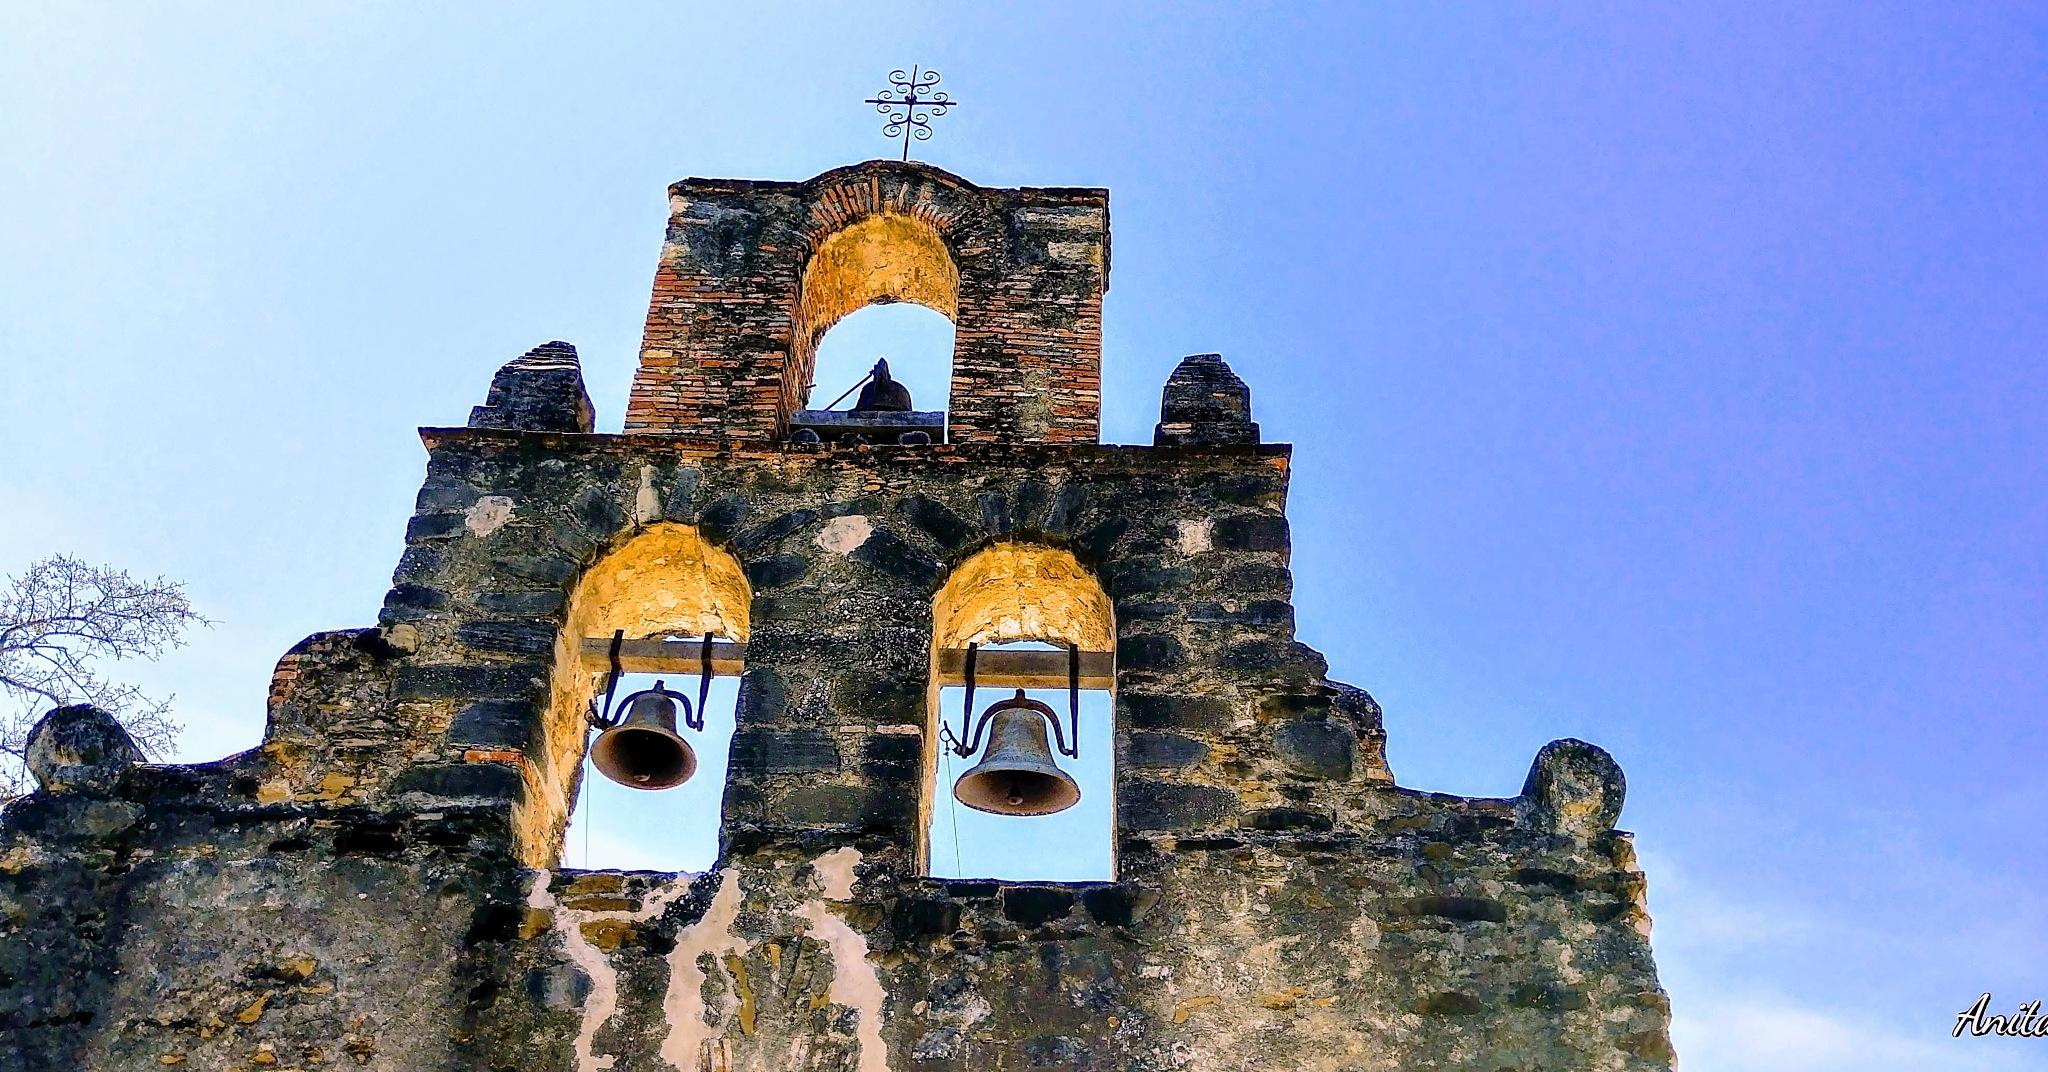 Mission trail San Antonio by shortacd